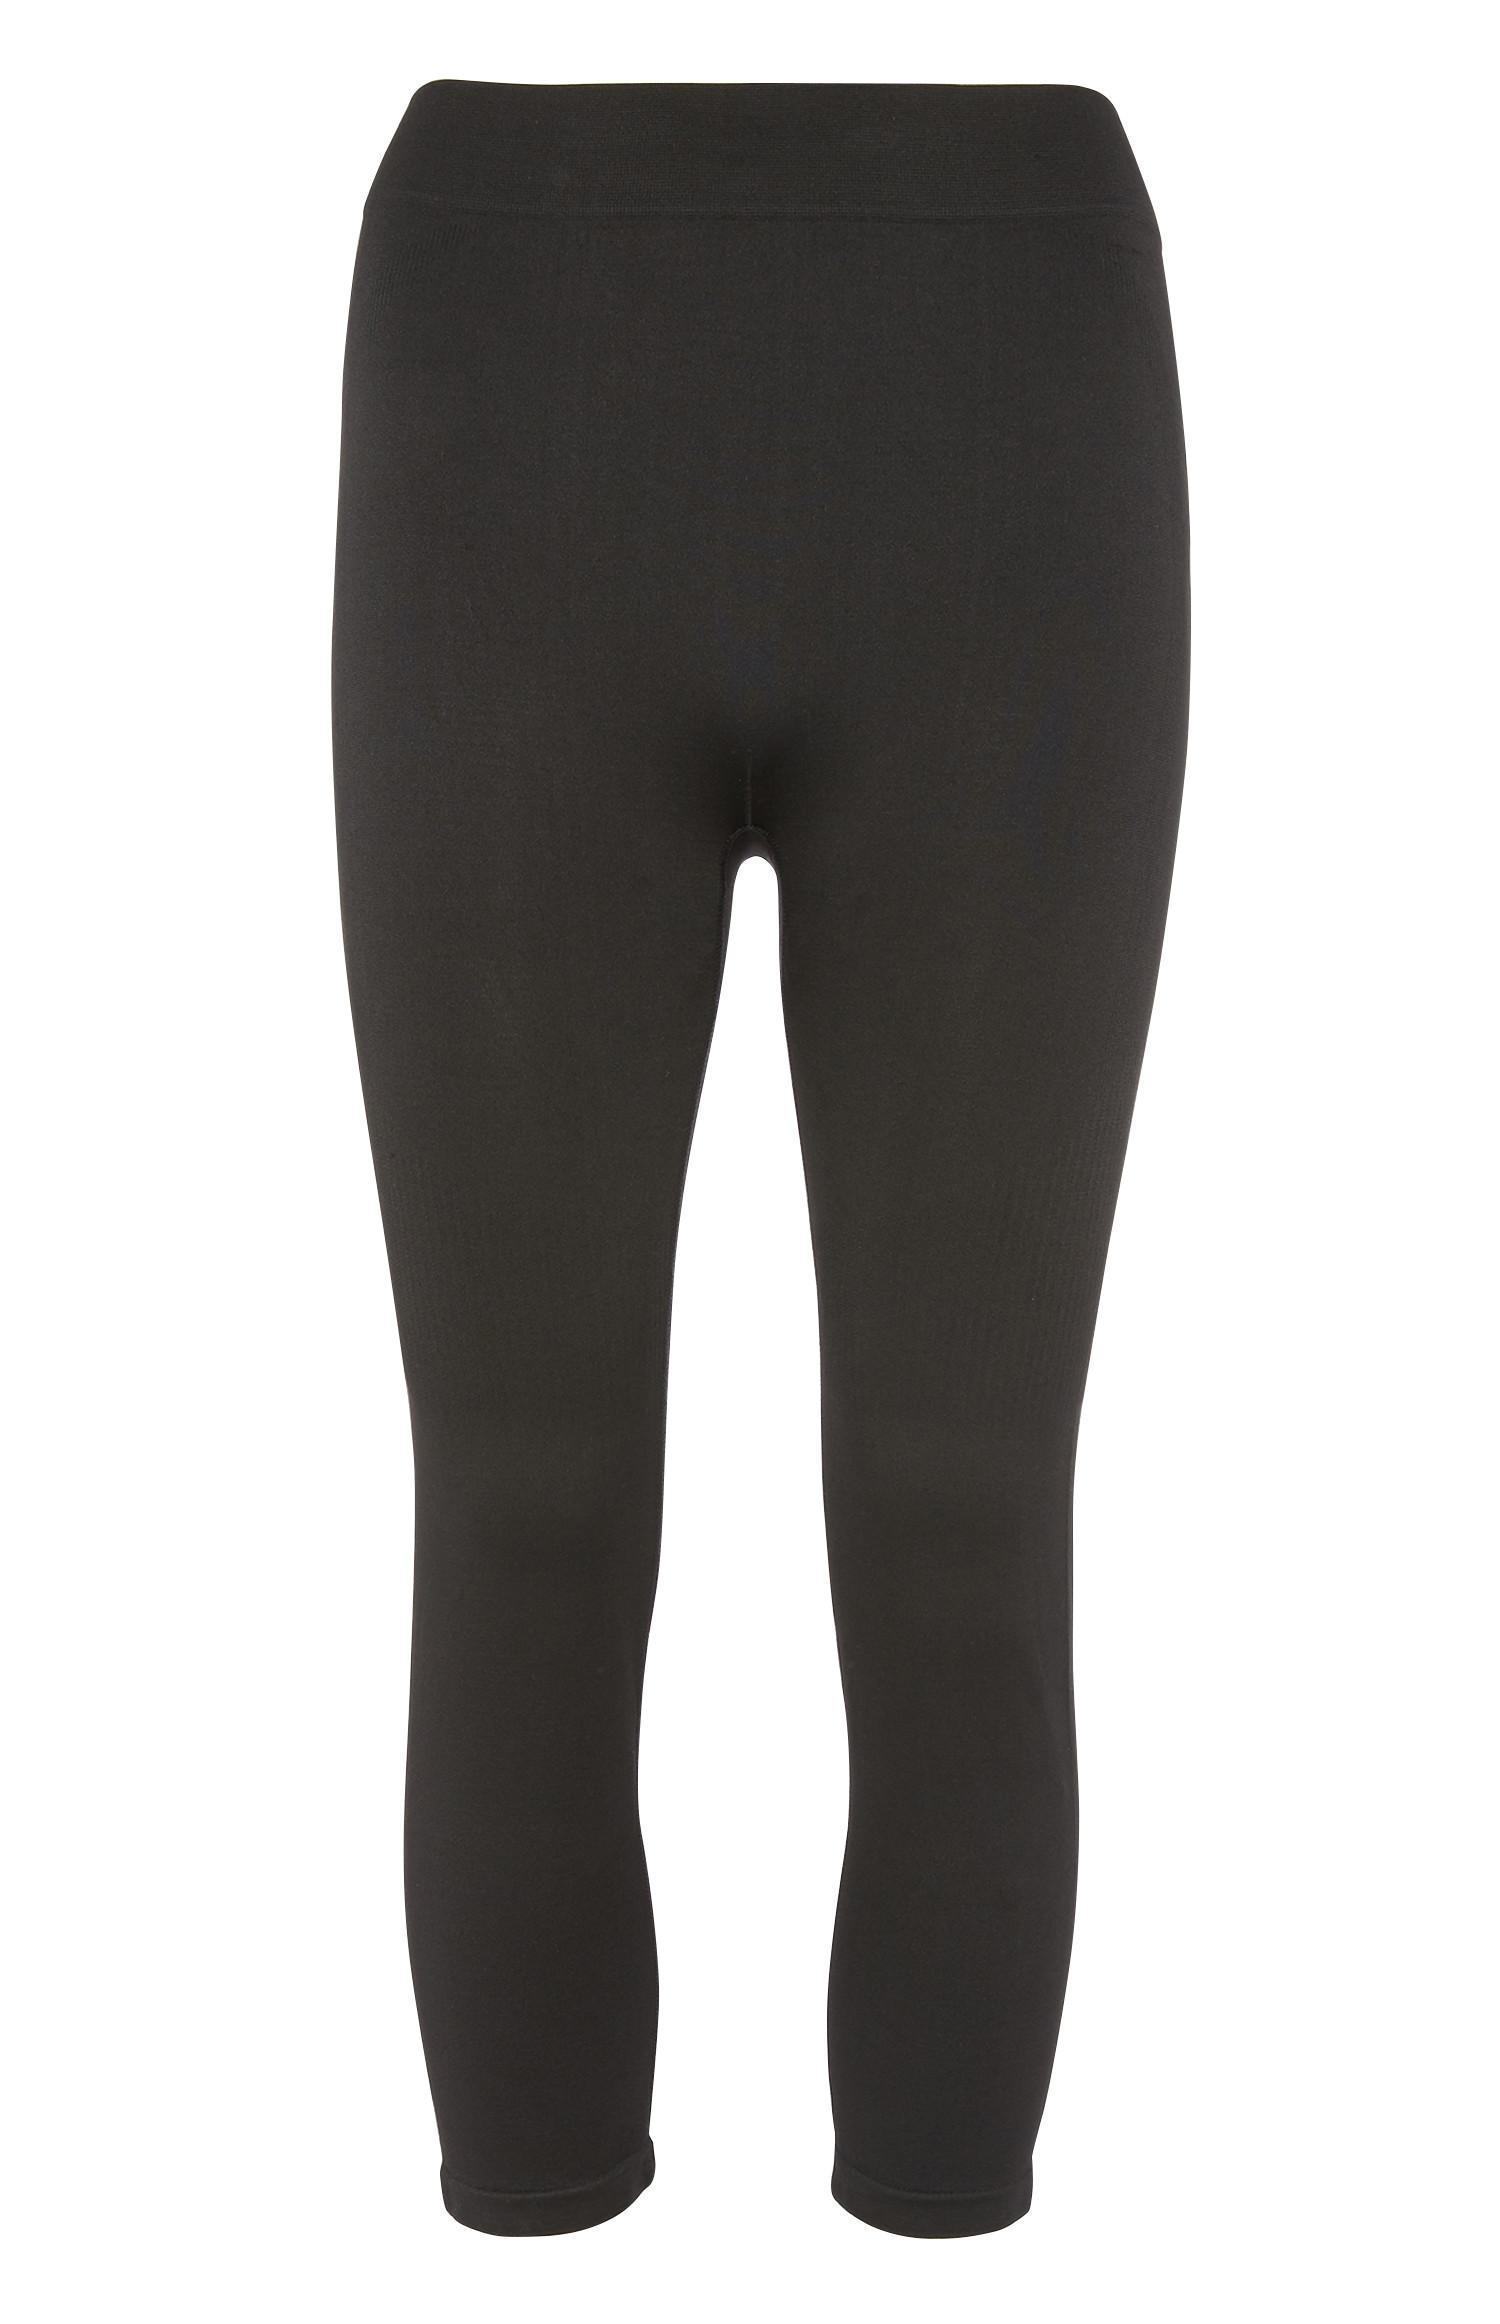 Black Crop Sport Legging